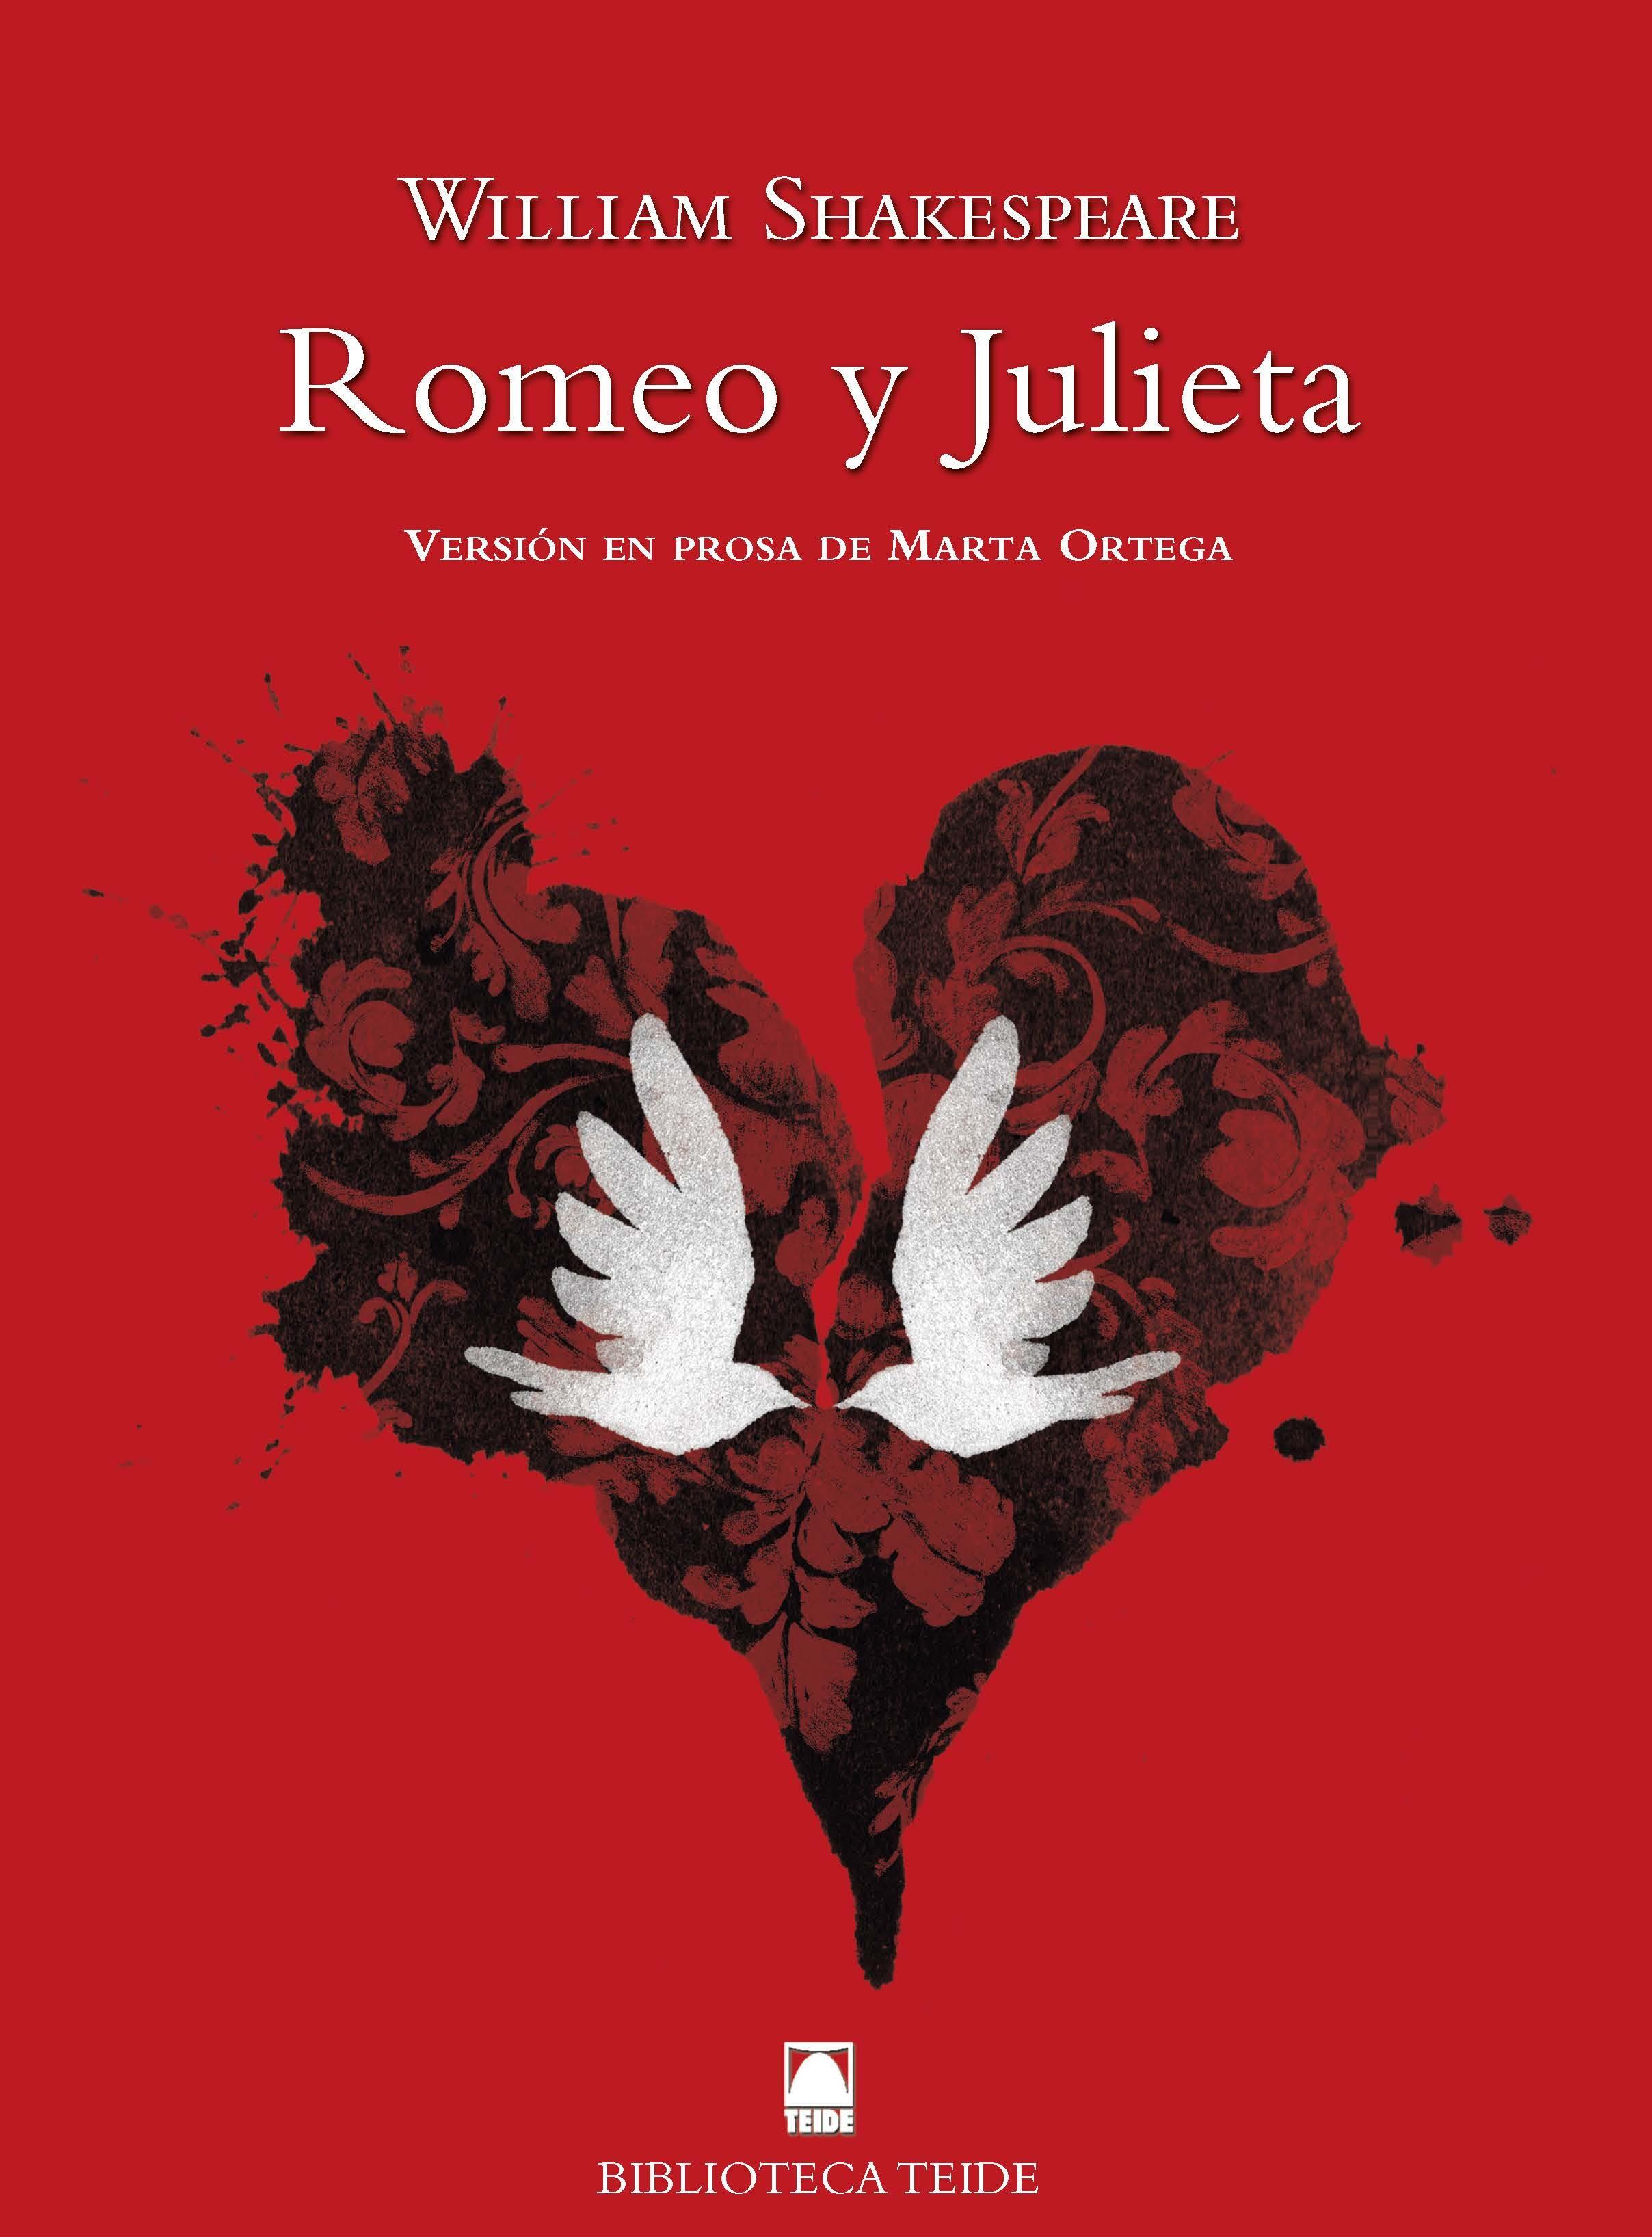 ROMEO Y JULIETA (BIBLIOTECA TEIDE 024)   WILLIAM SHAKESPEARE   Comprar libro 9788430760626